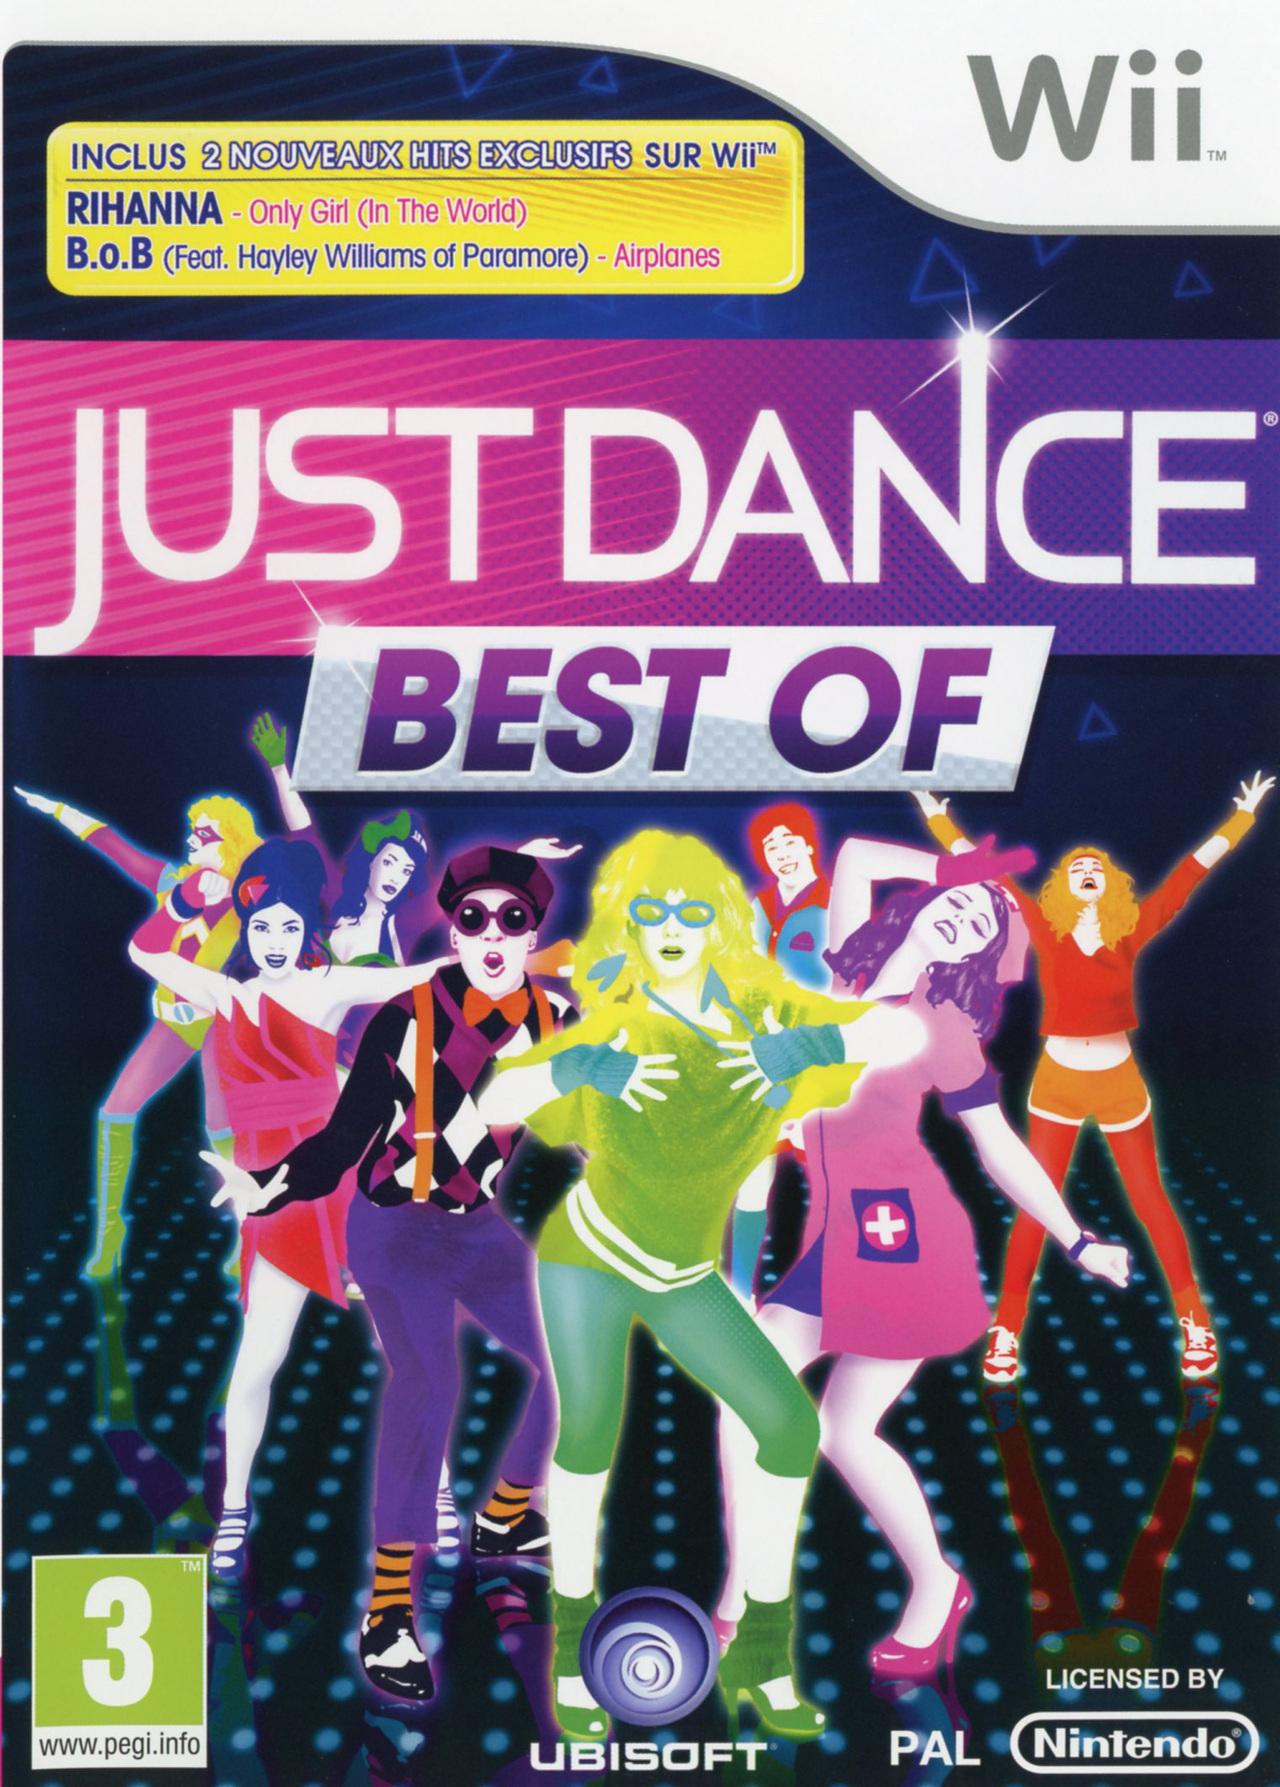 Just Dance Best Of Sur Wii